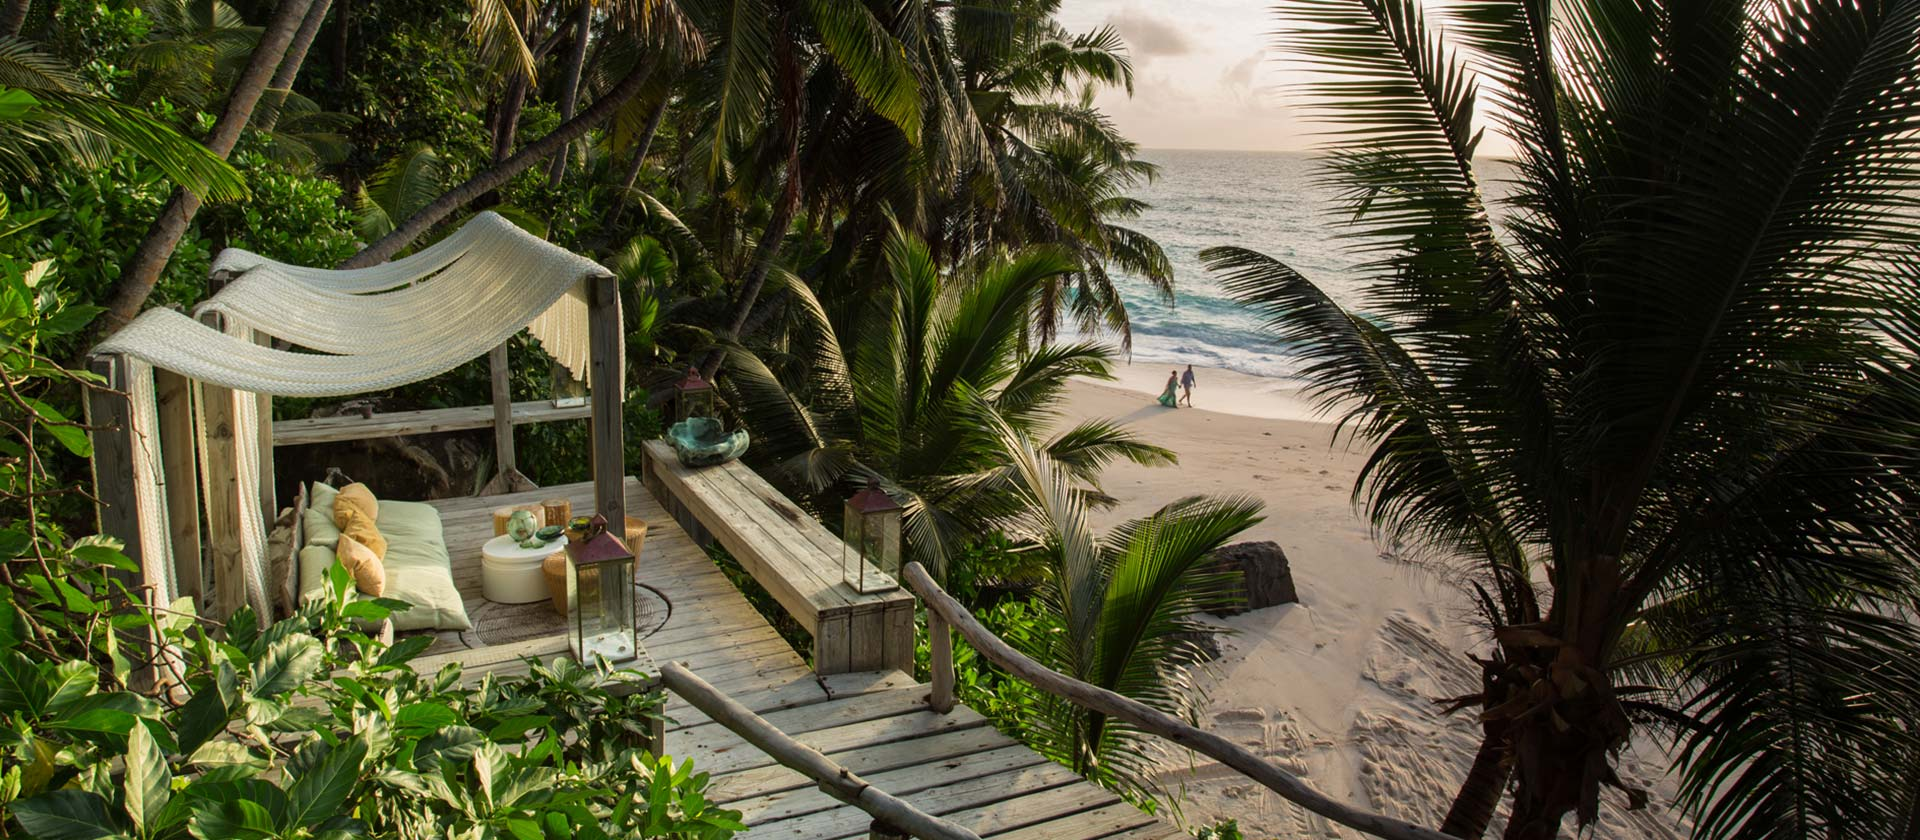 north_island_seychelles38.jpg